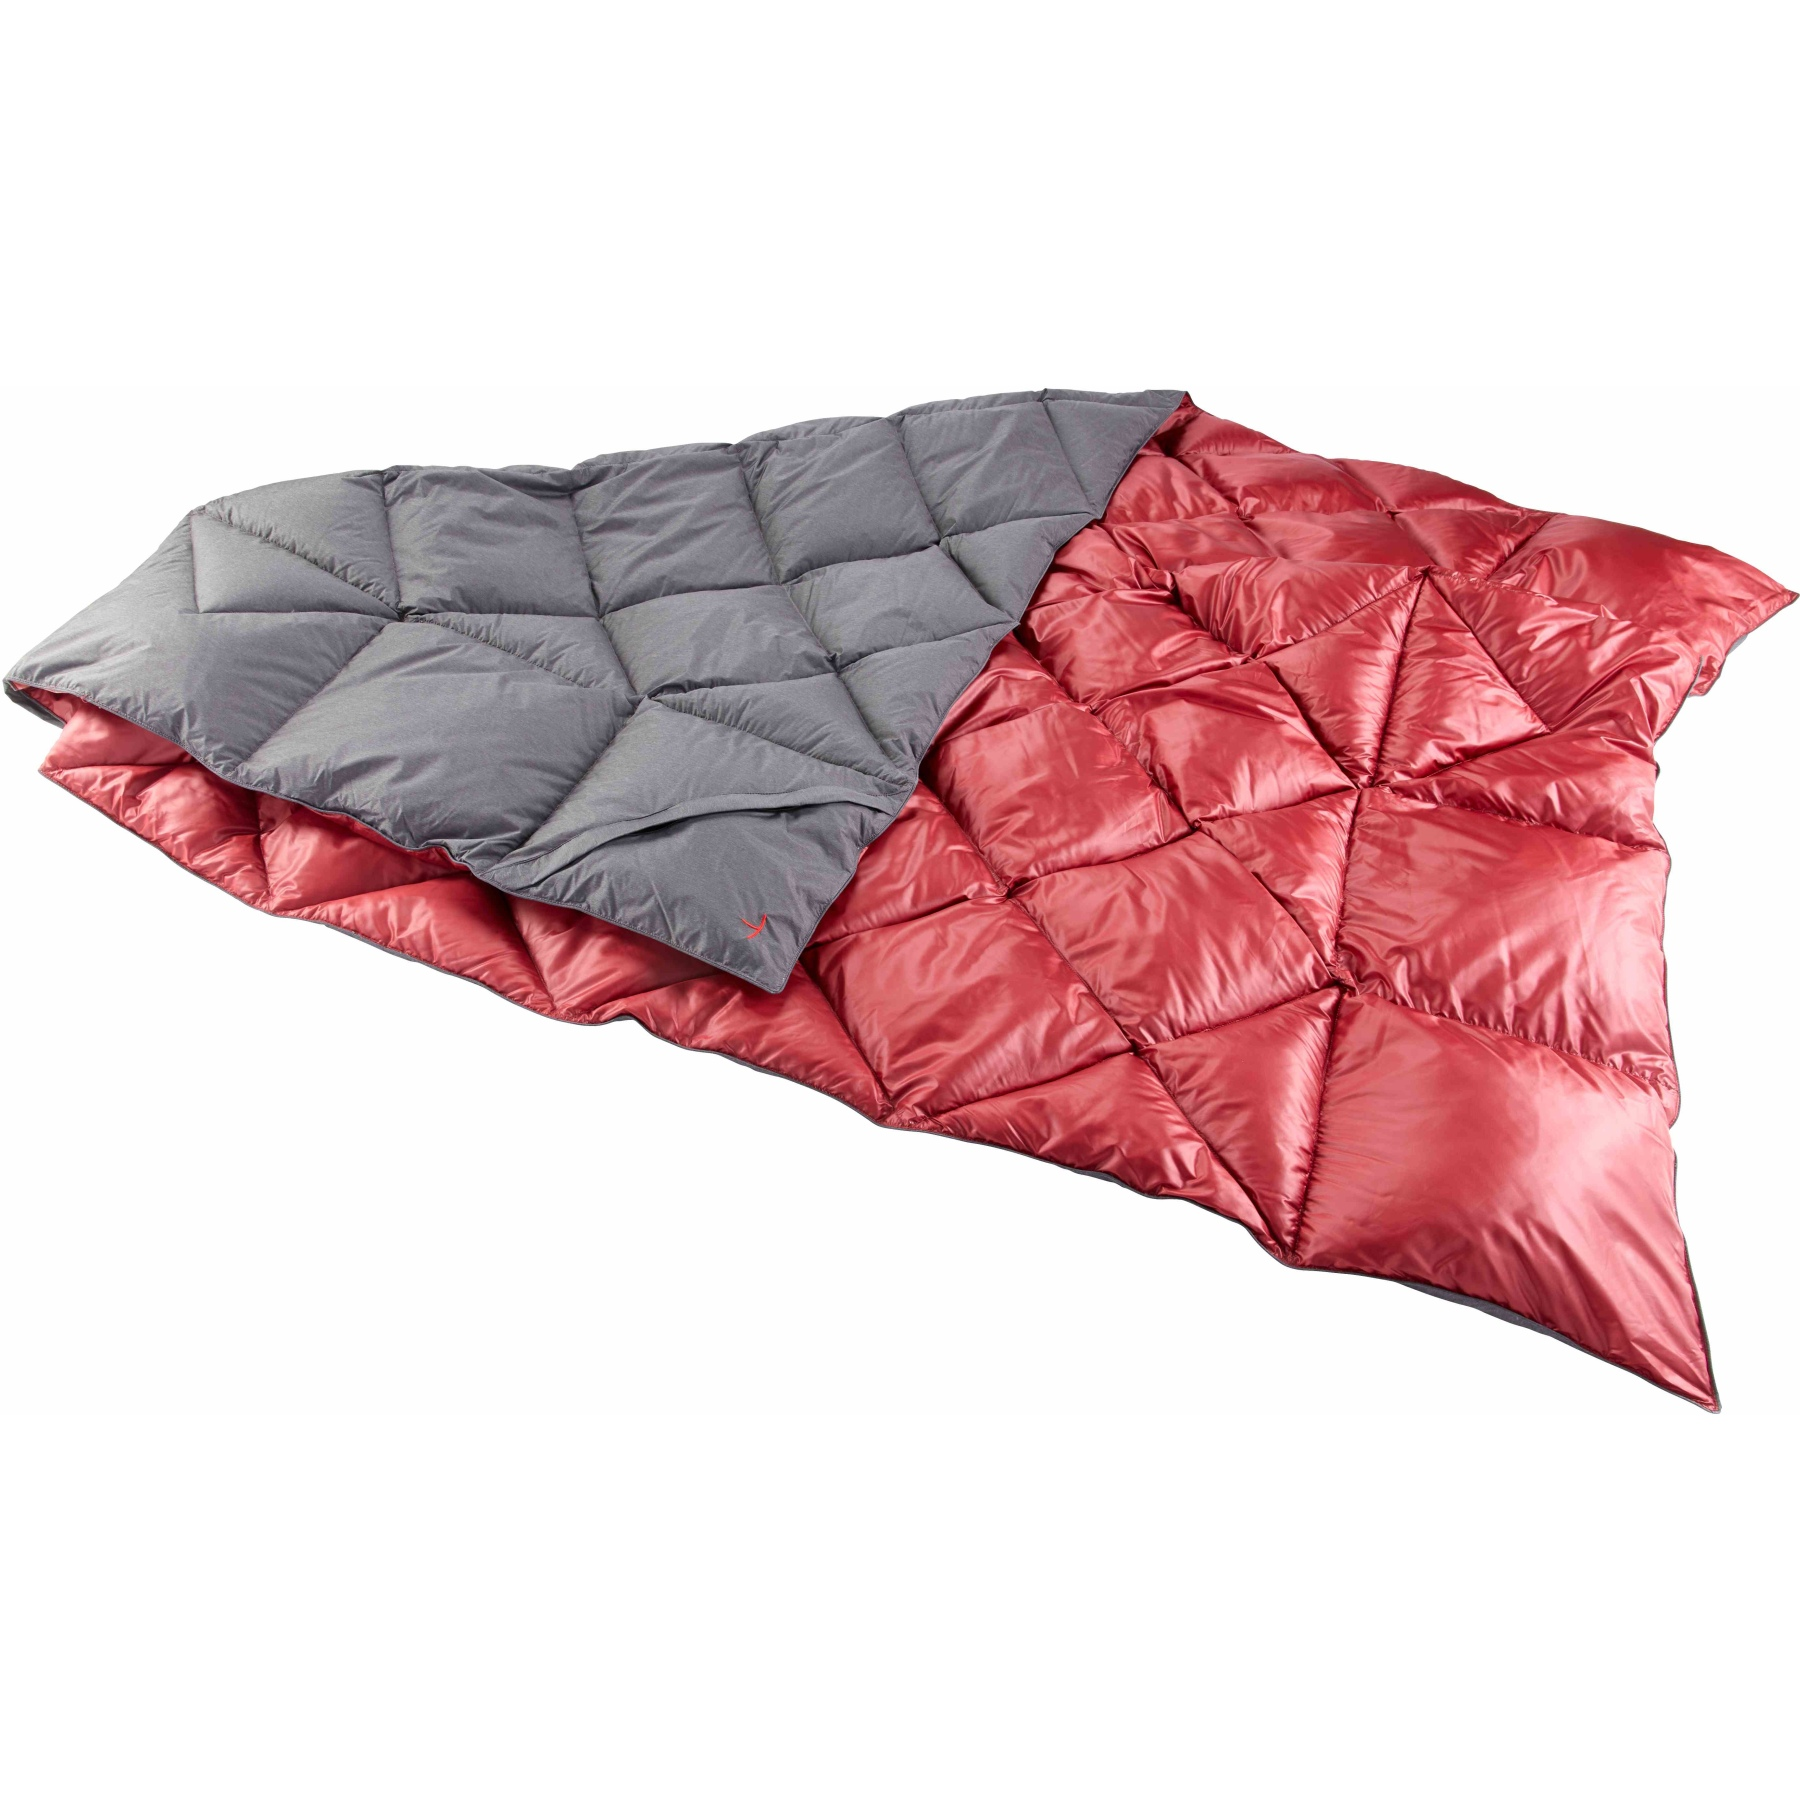 Y by Nordisk Kiby Packbare, daunengefüllte Reisedecke - coal grey/cranberry red